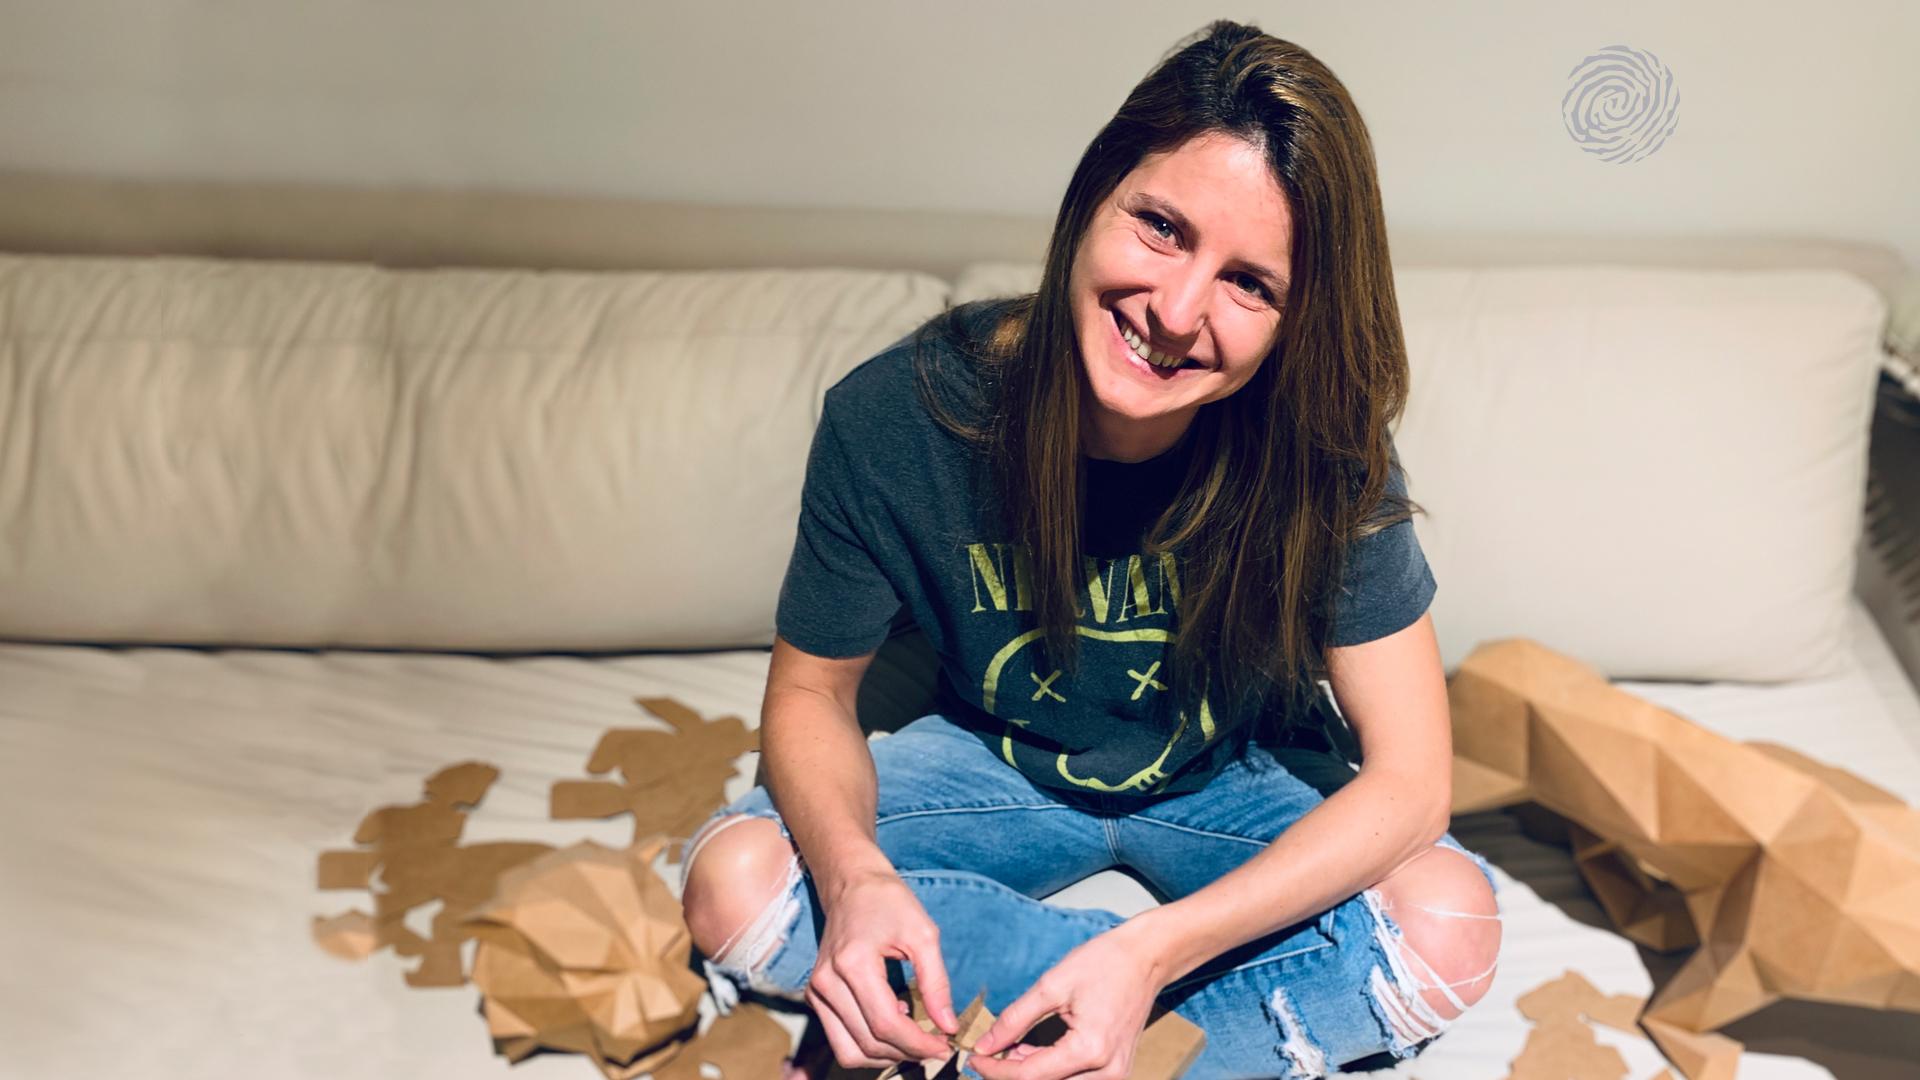 Greta Zuberbühler, la arquitecta detrás de Zeta